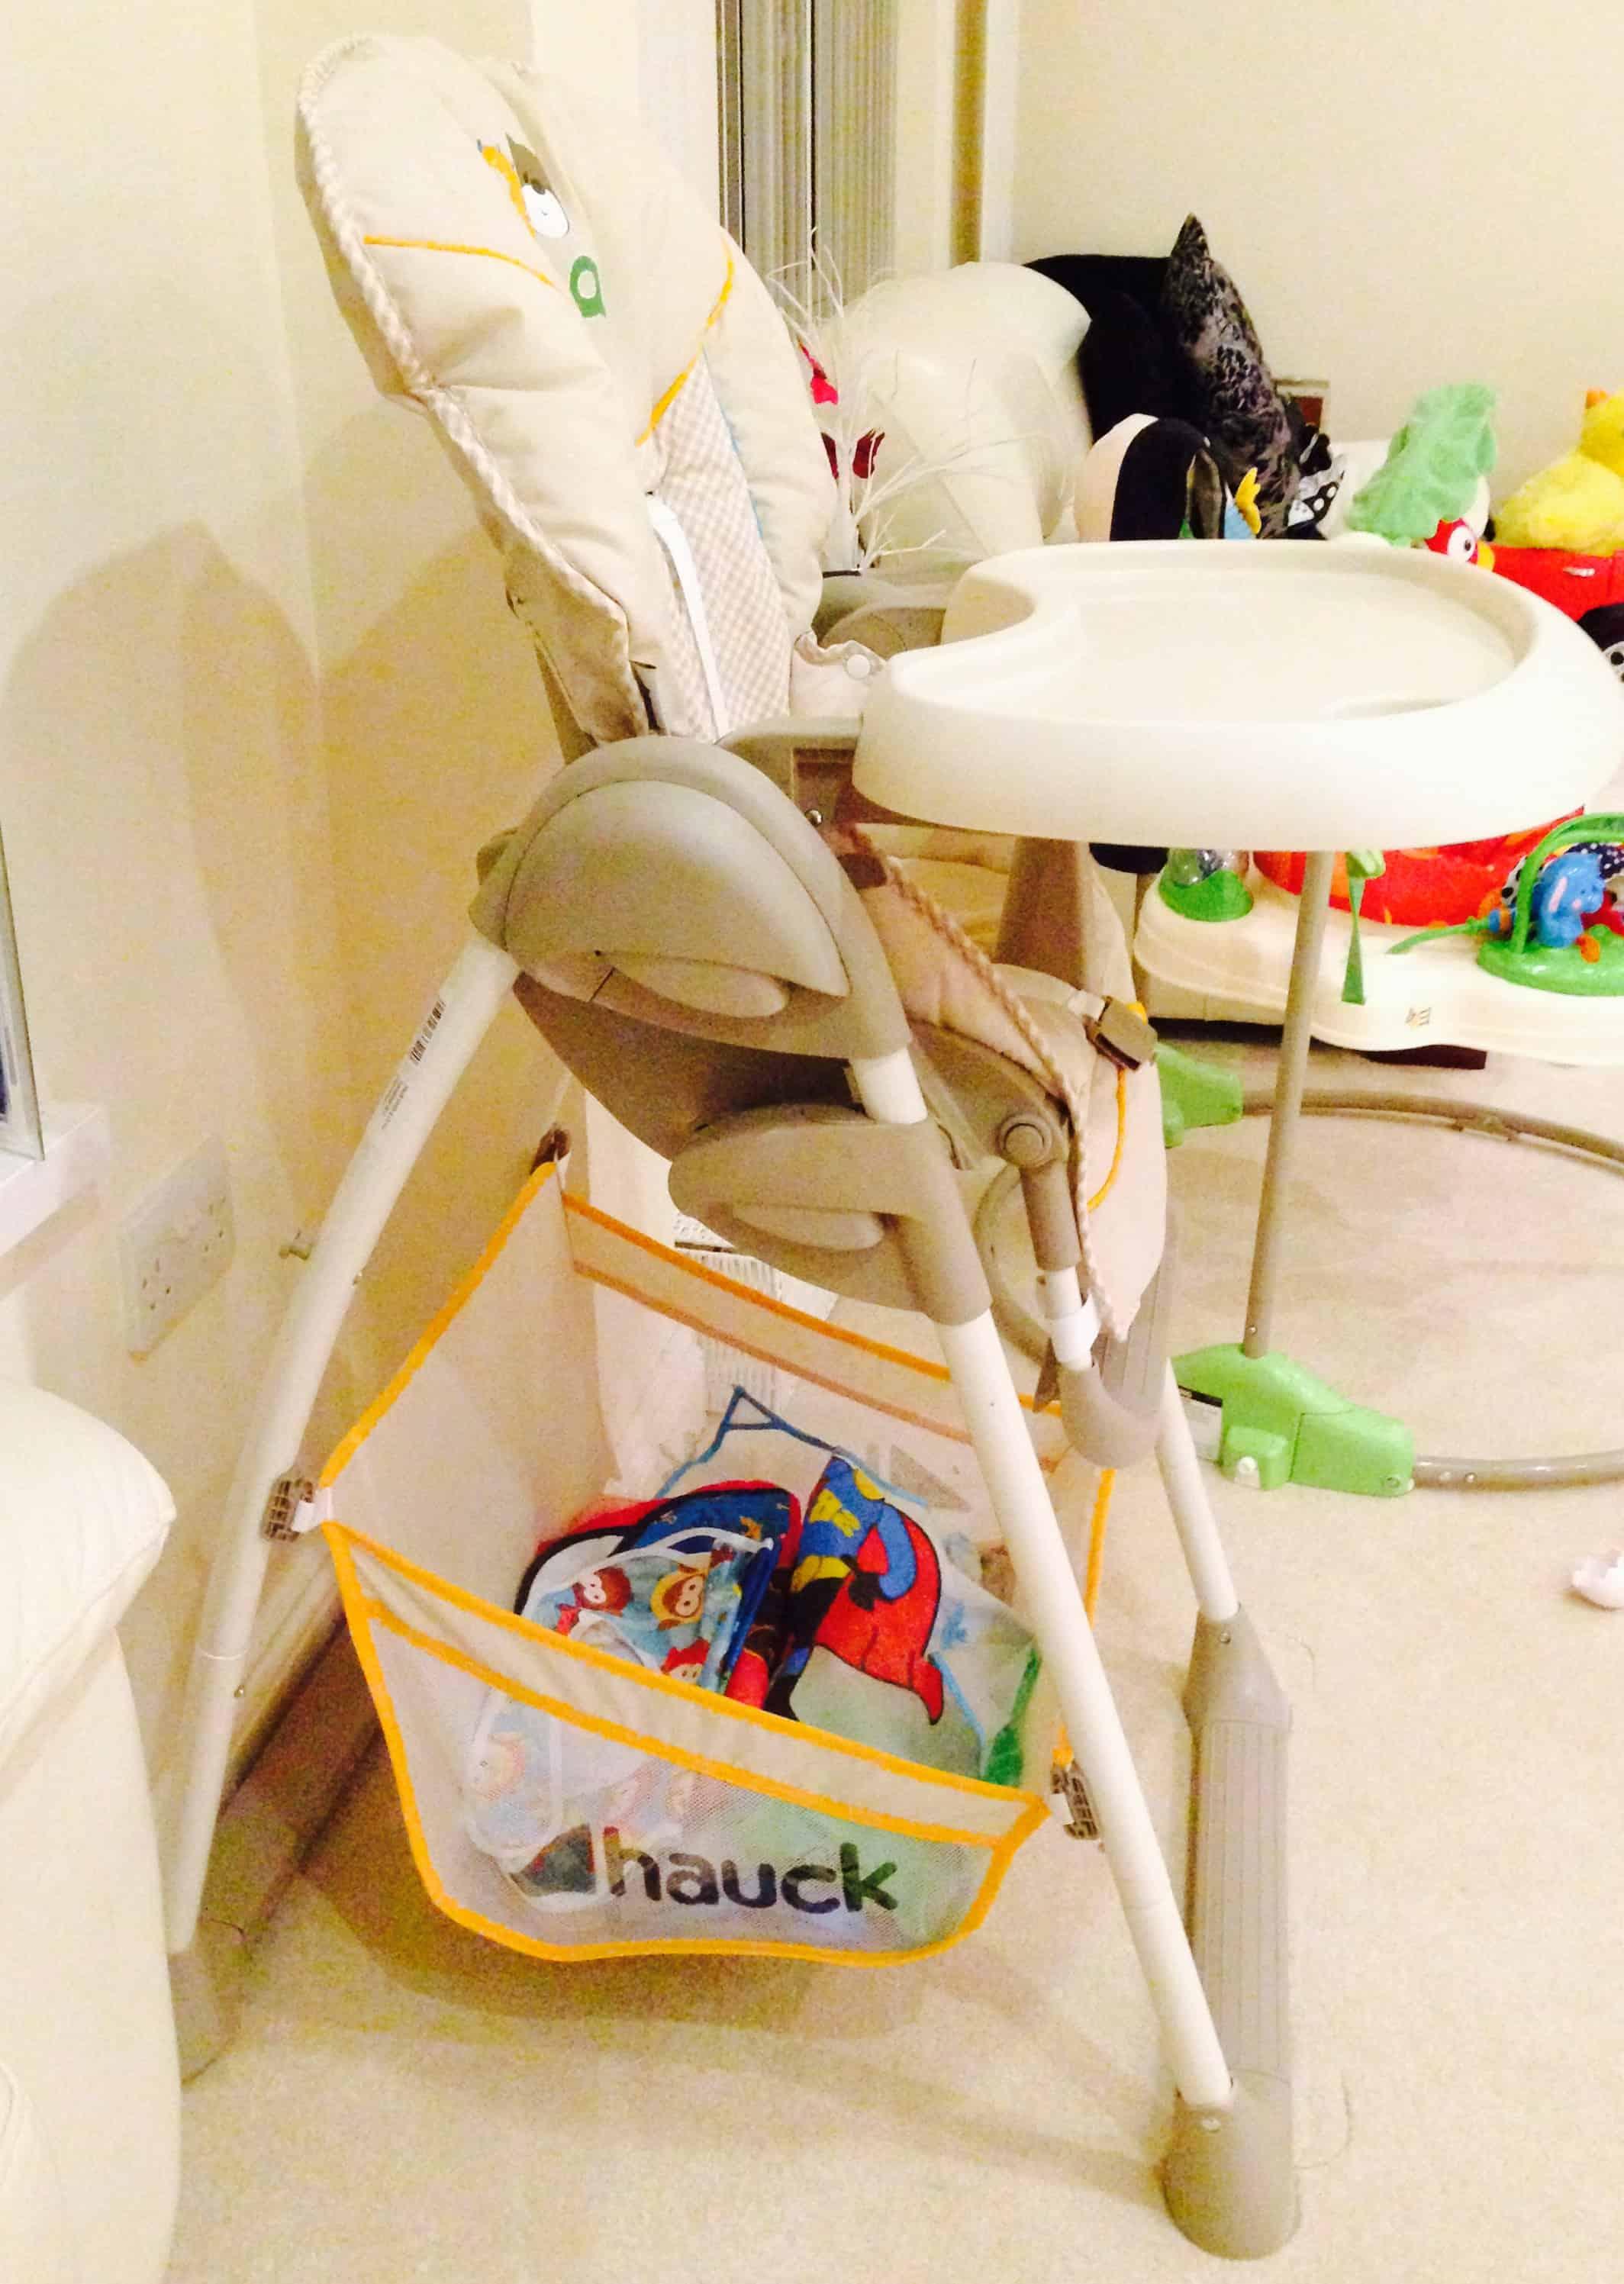 hauck high chair portable travel sit n relax review baby brain memoirs